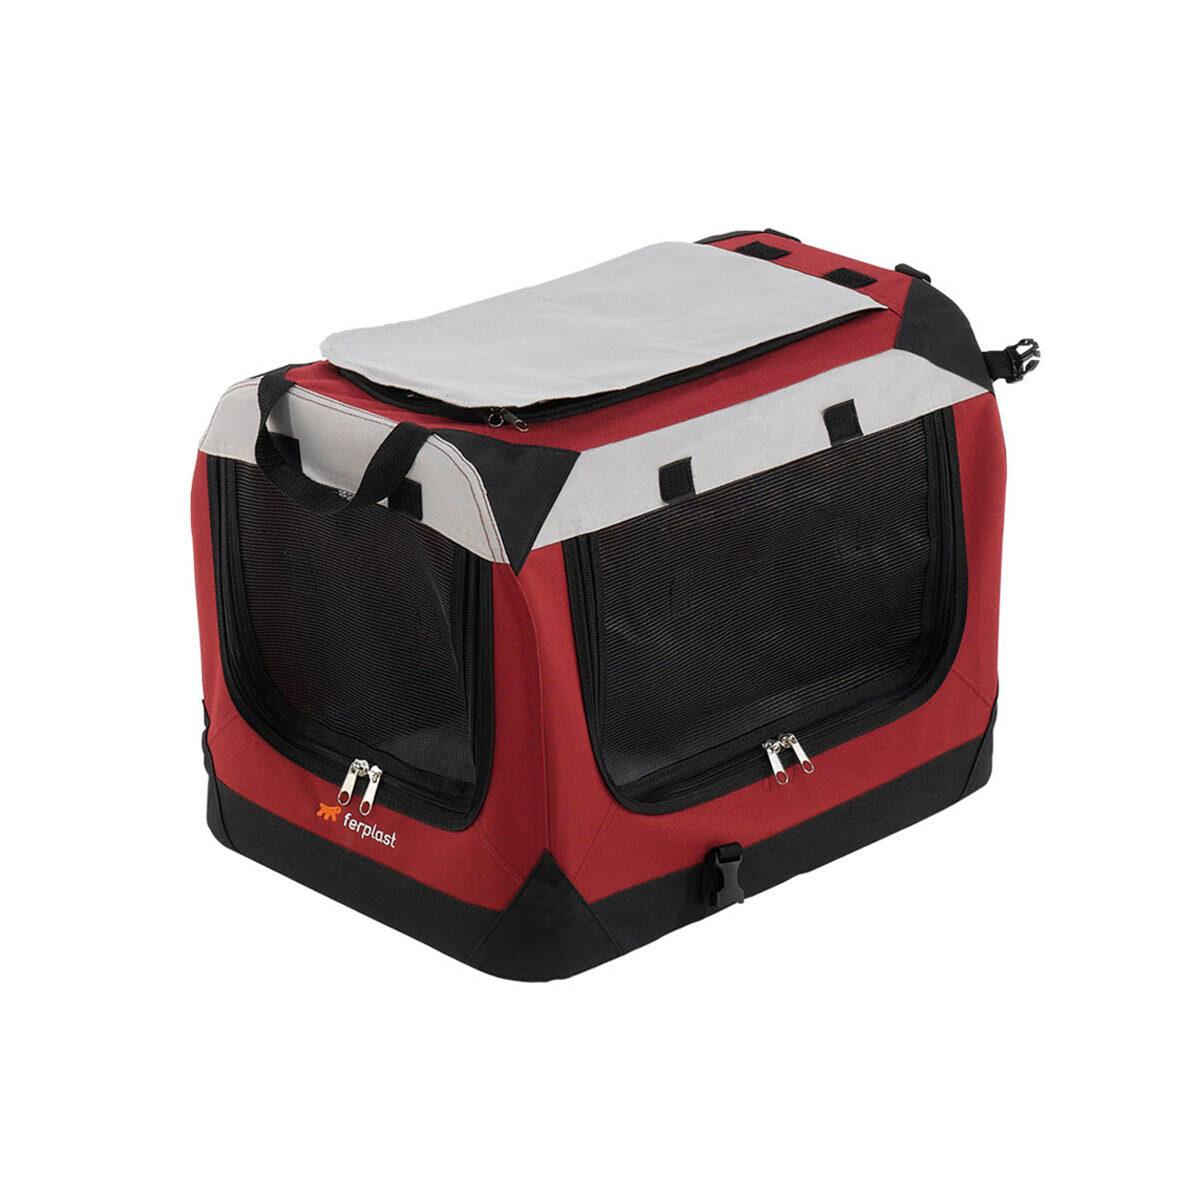 Ferplast Hondenvervoersbox Holiday 4 - 60x42x42 cm